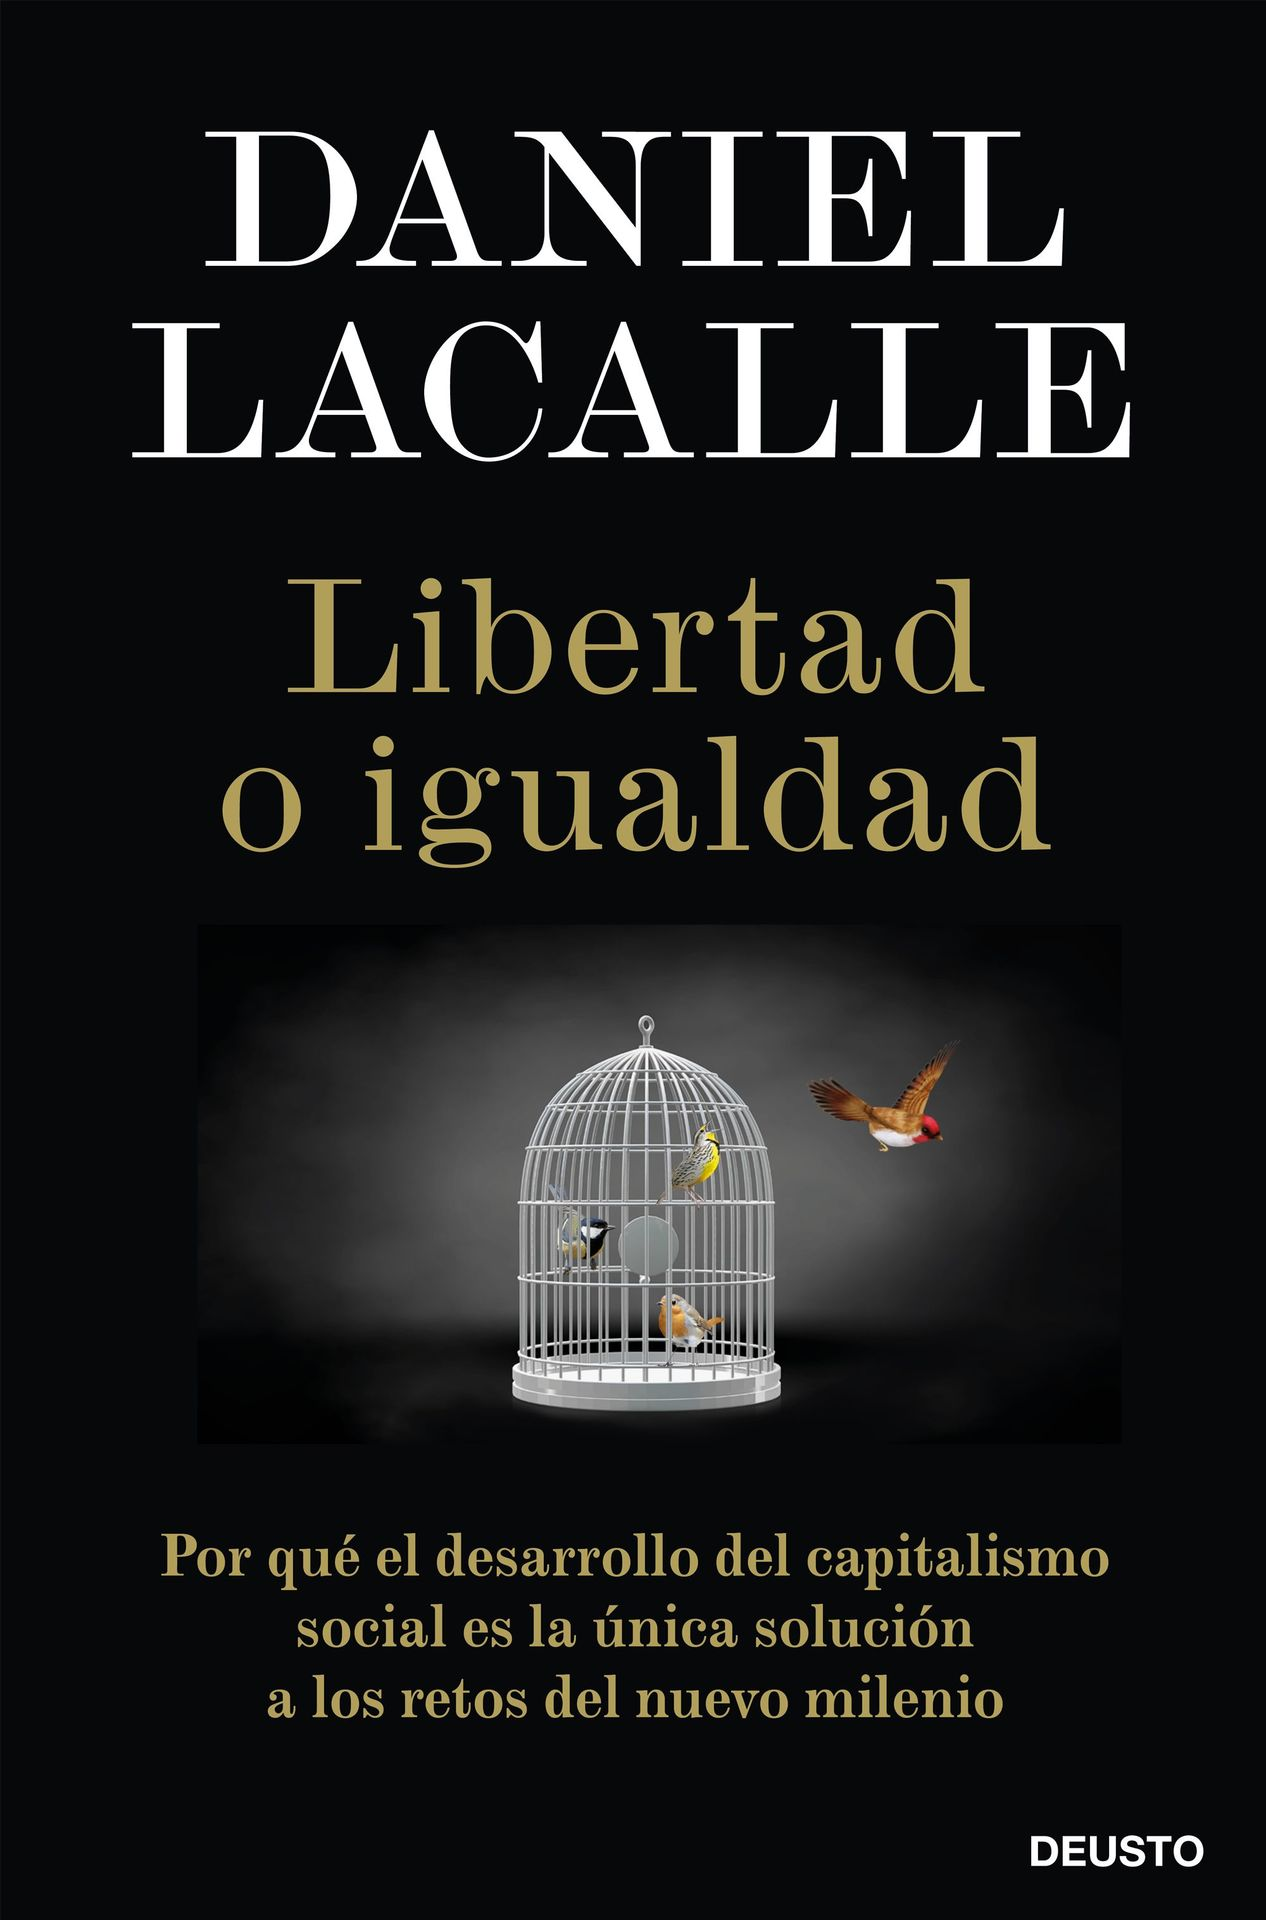 libertad-o-igualdaddaniel-lacalle201912301558.jpg